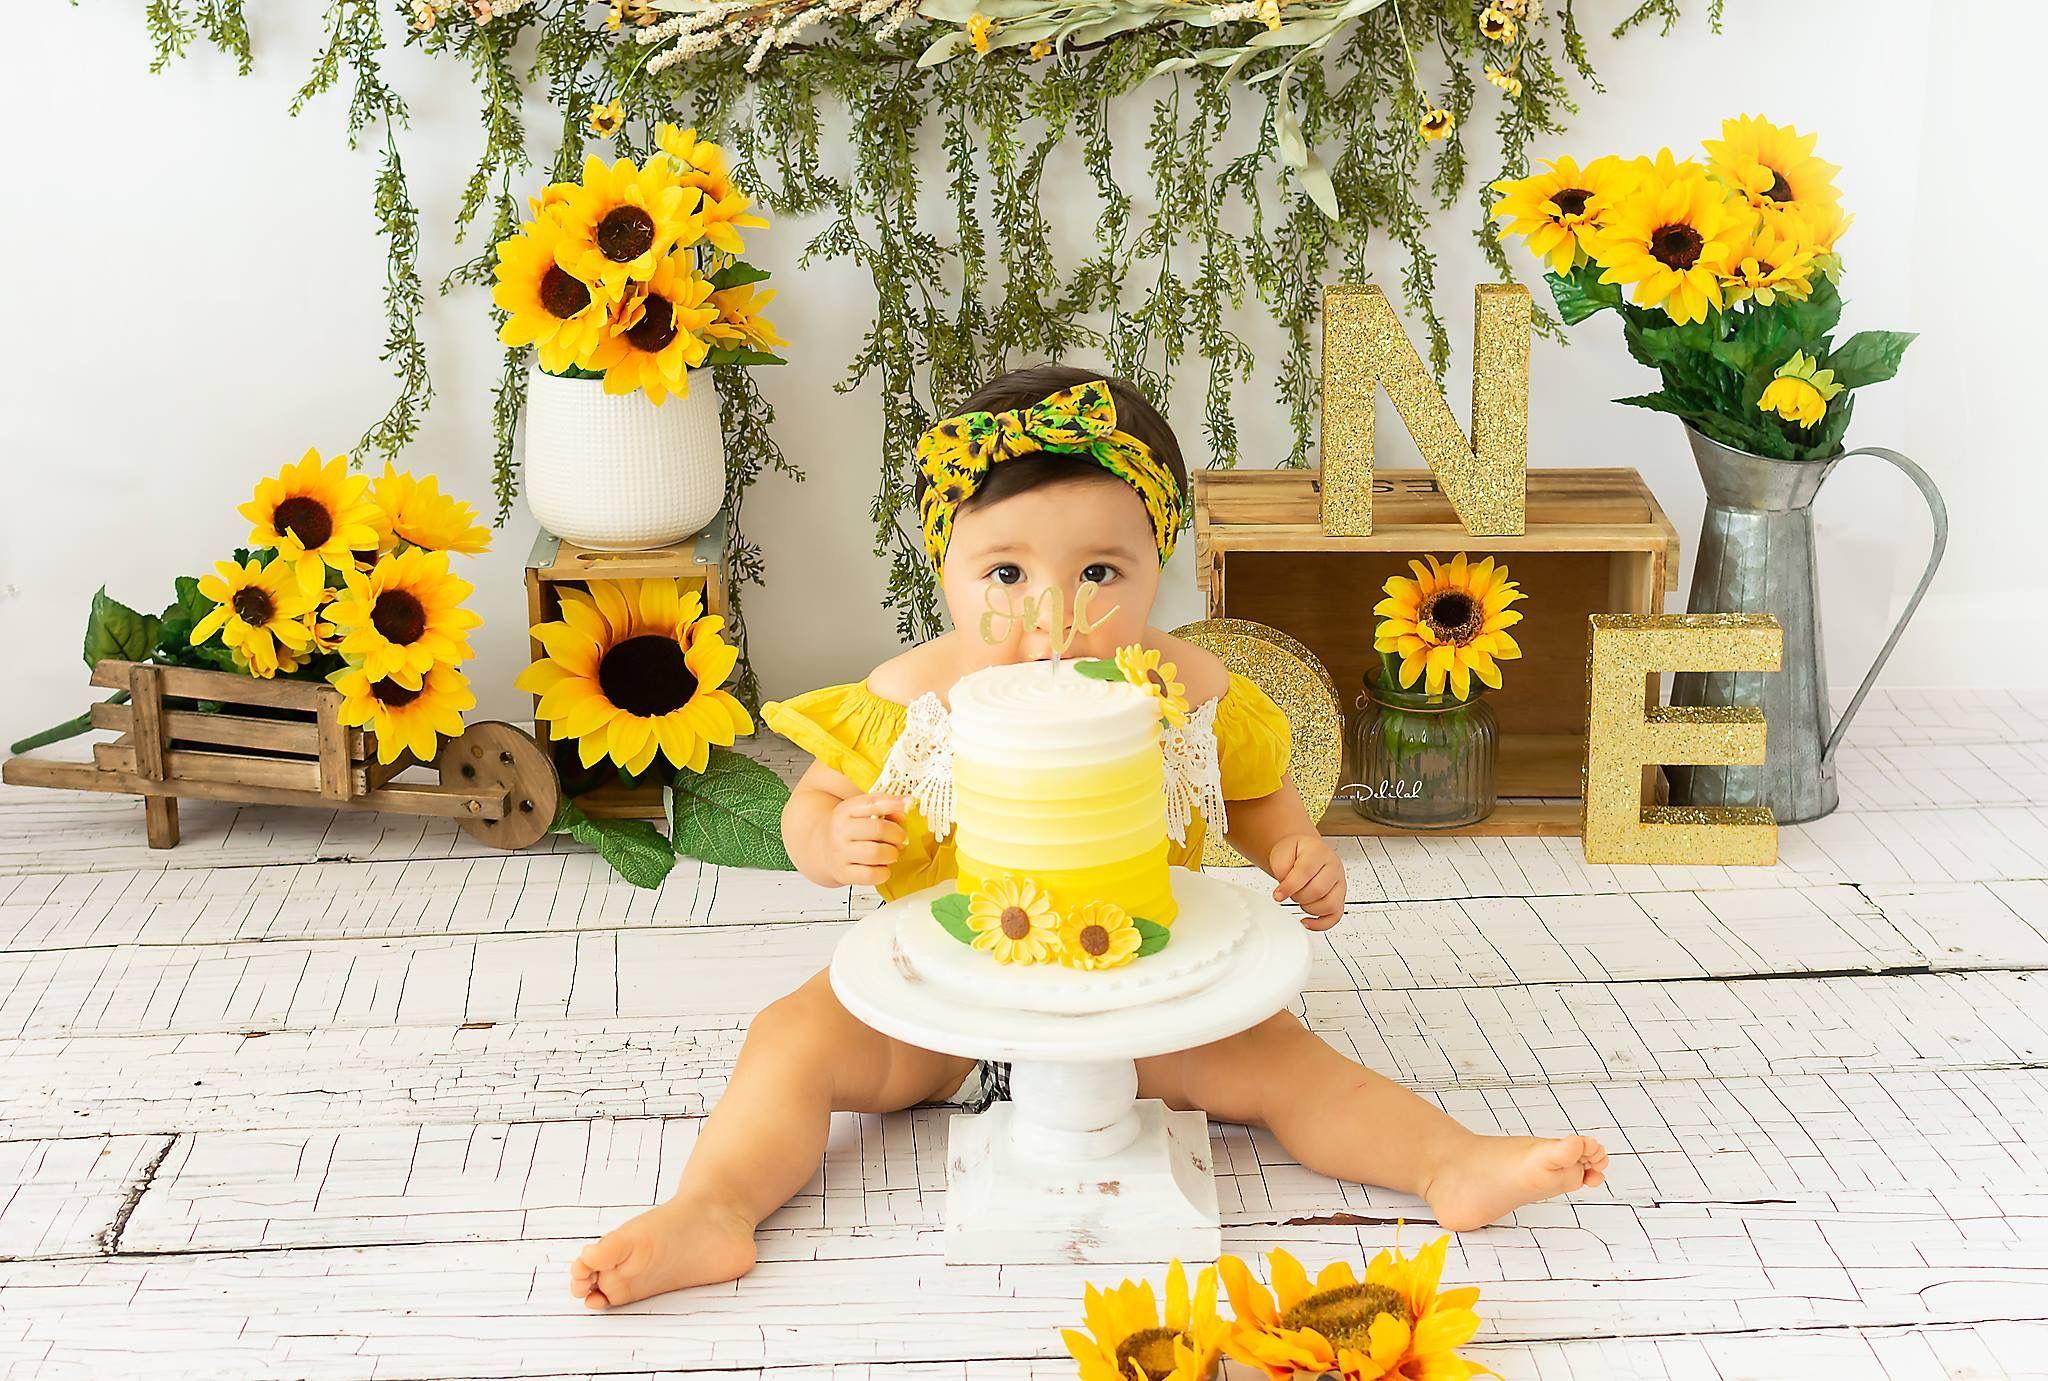 Sunflower Theme Cake Smash #sunflowers #firstbirthday